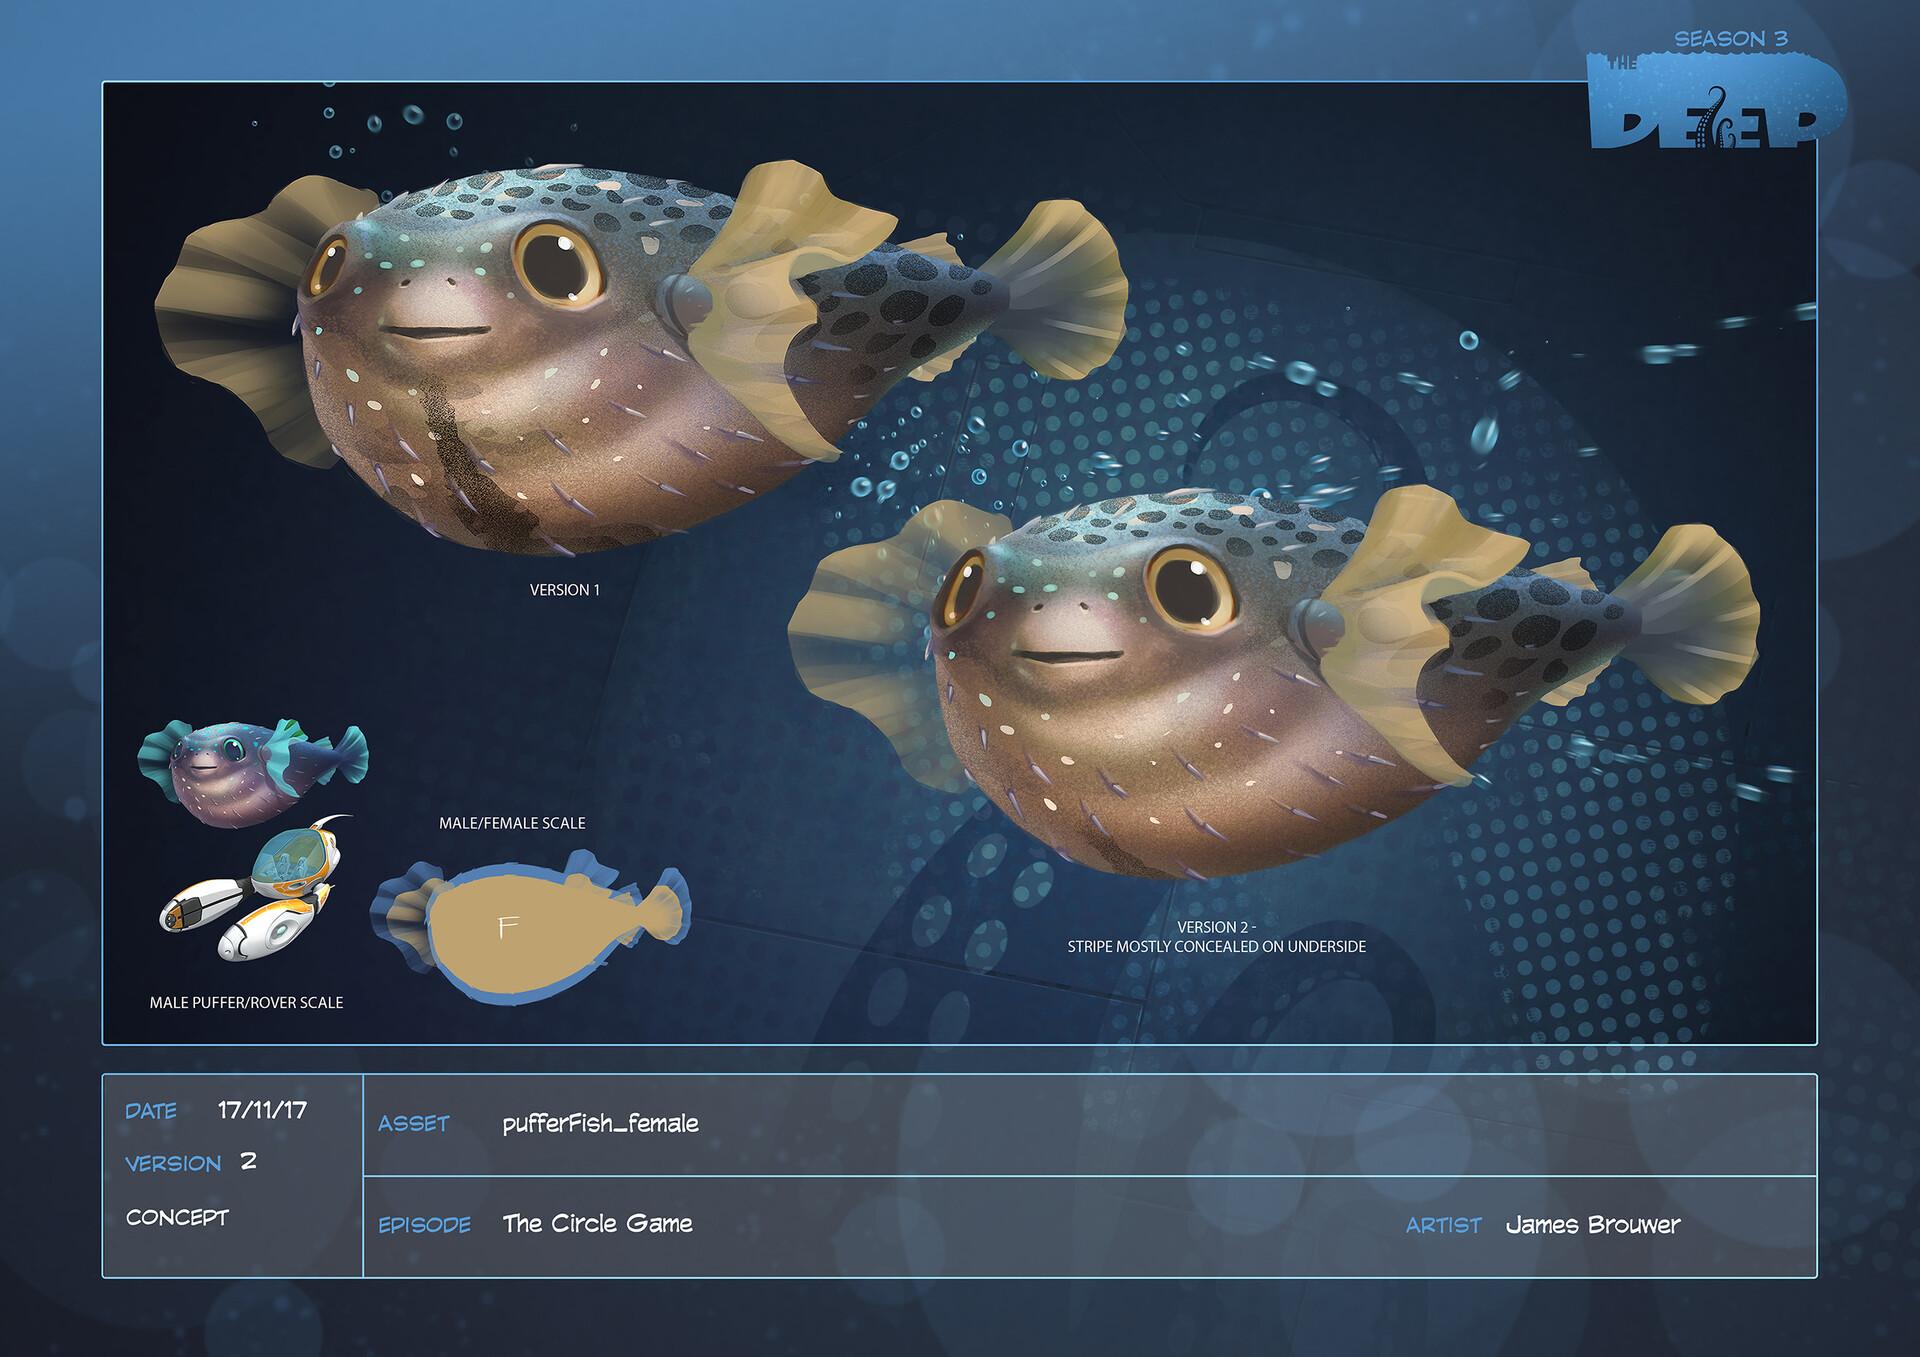 James brouwer pufferfish female design v002